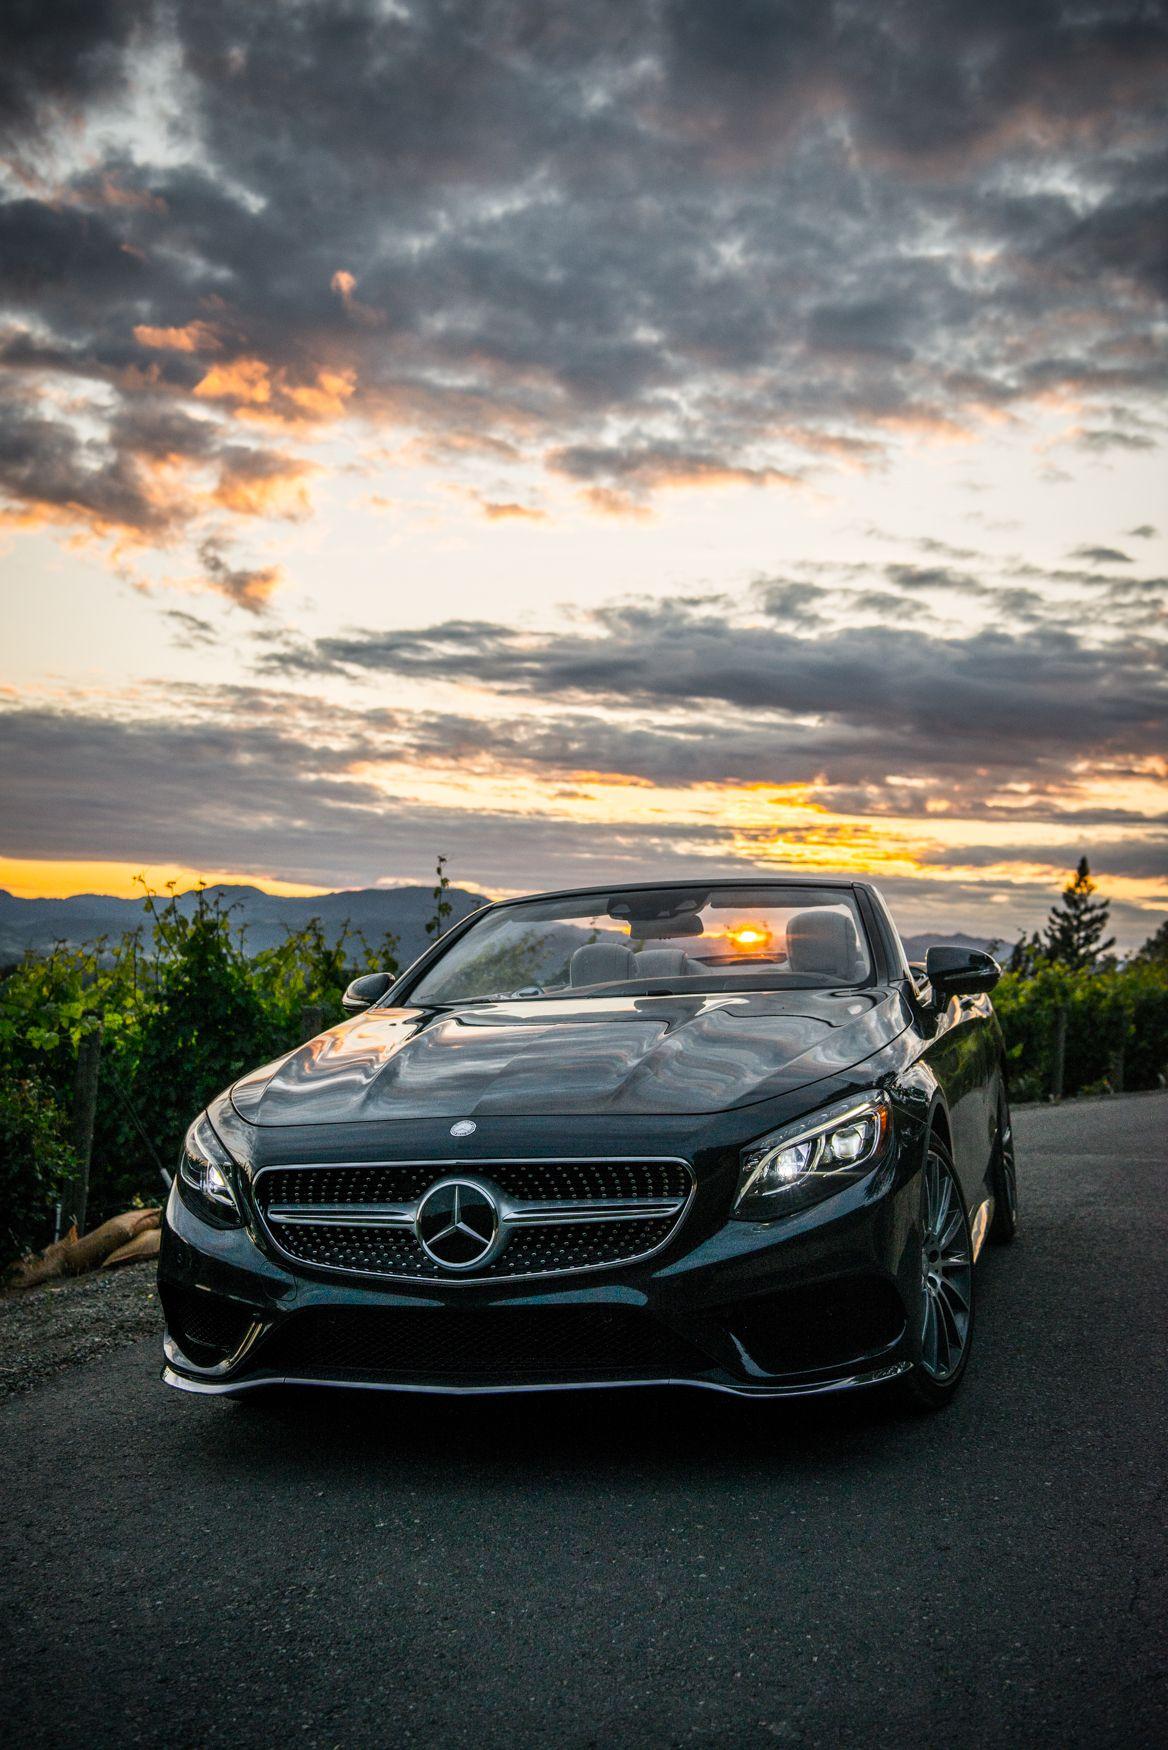 Open-top luxury. Photo by Trent Bona (www.trentbona.photoshelter.com) for #MBphotopass via @mercedesbenzusa